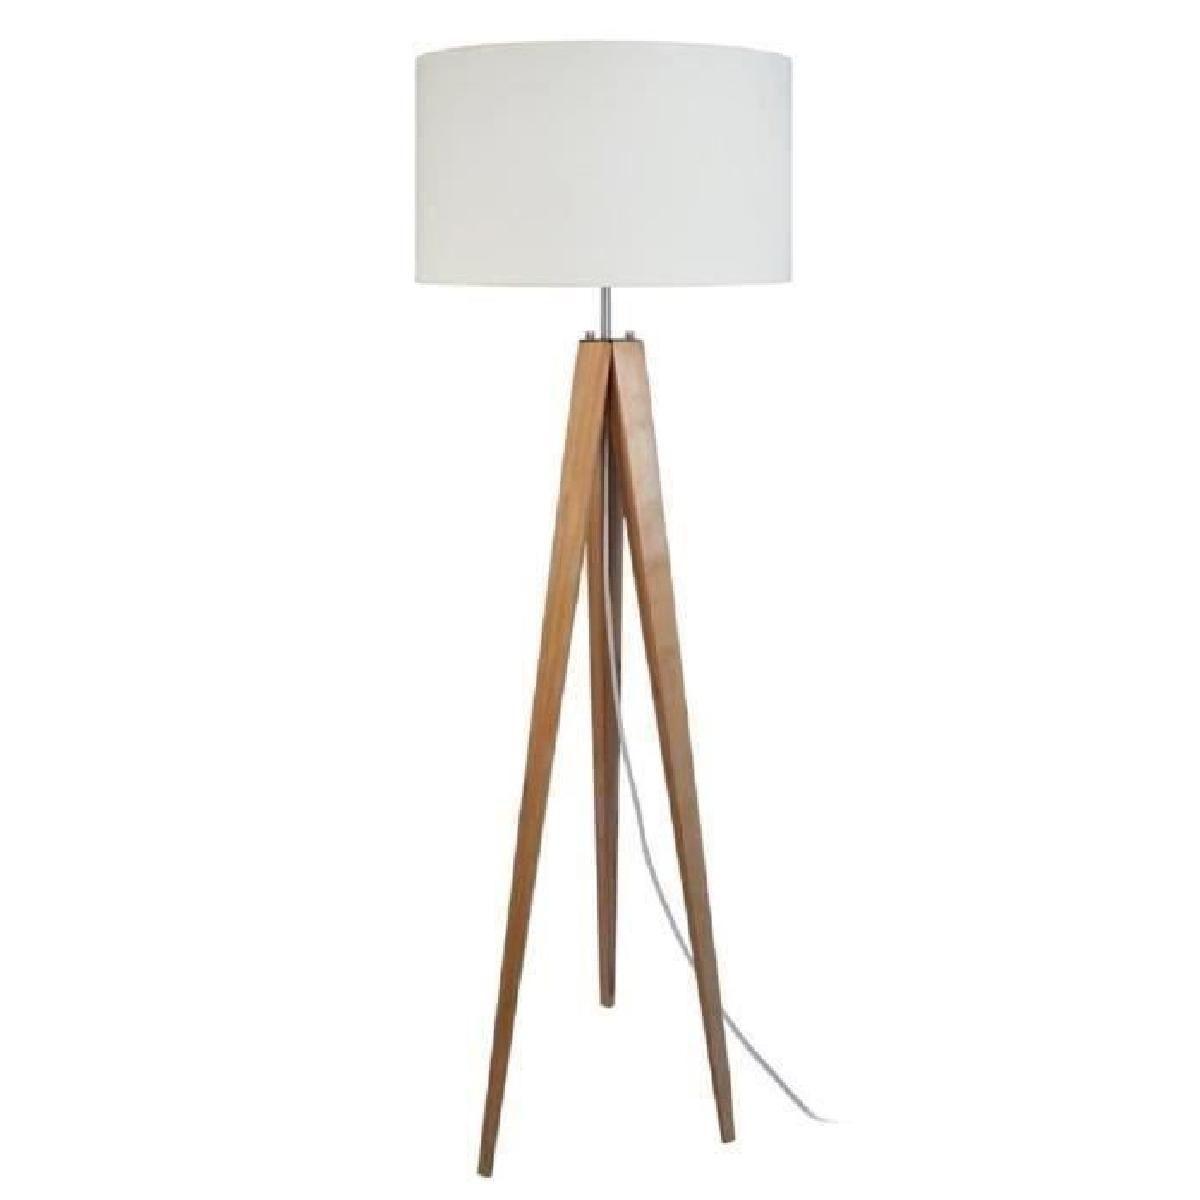 25 Satisfaisant Lampe Lampadaire Collection Check More At Https Www Jorgemorel Net 115659 25 Satisfaisant Lampe Lampadaire Collection